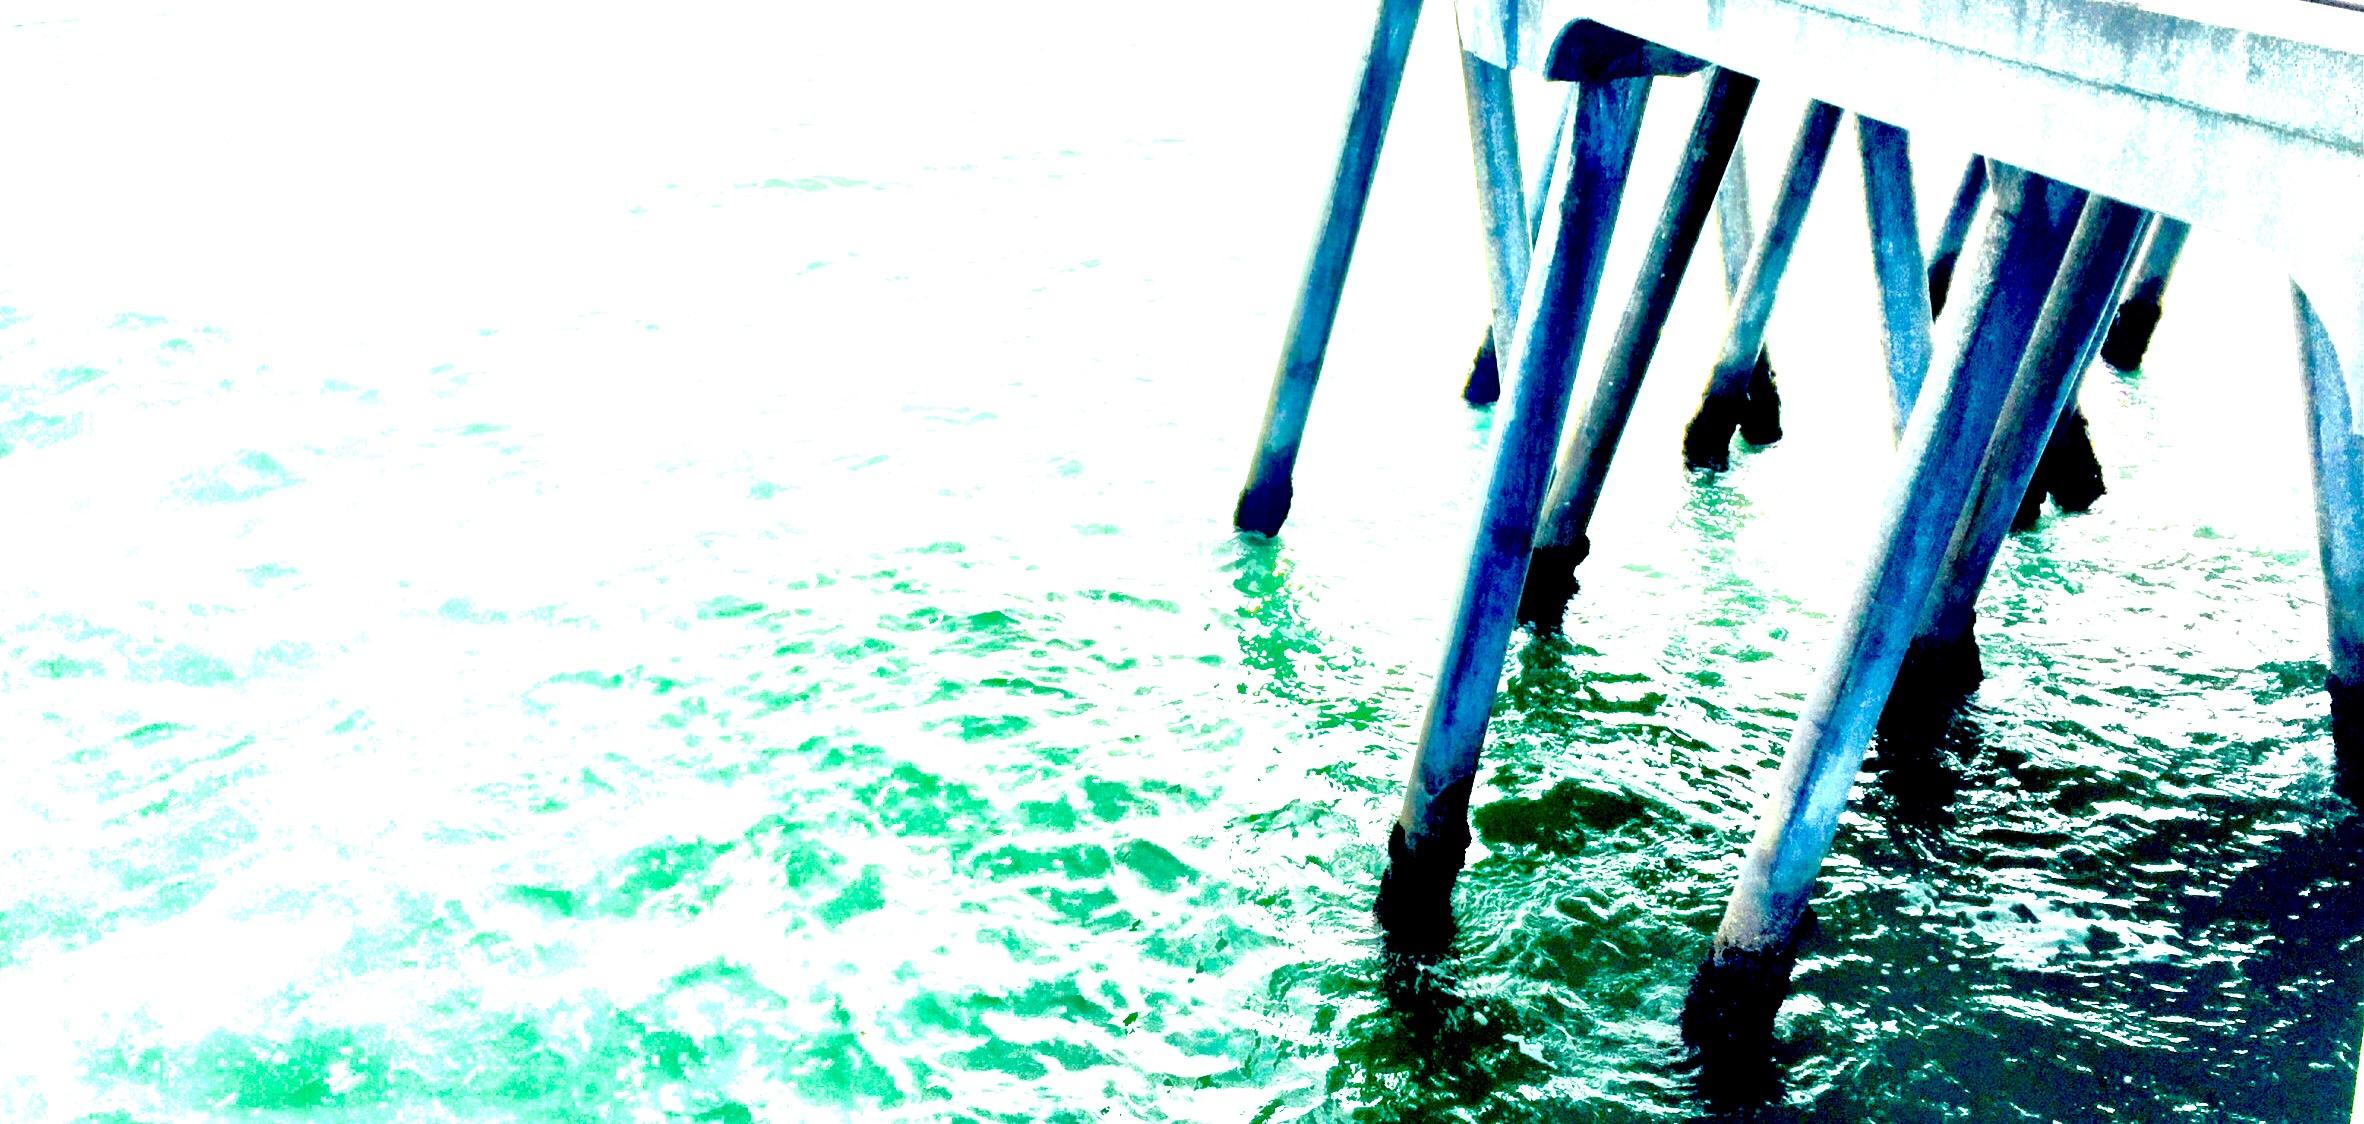 walking on water, huntington beach © colin goedecke